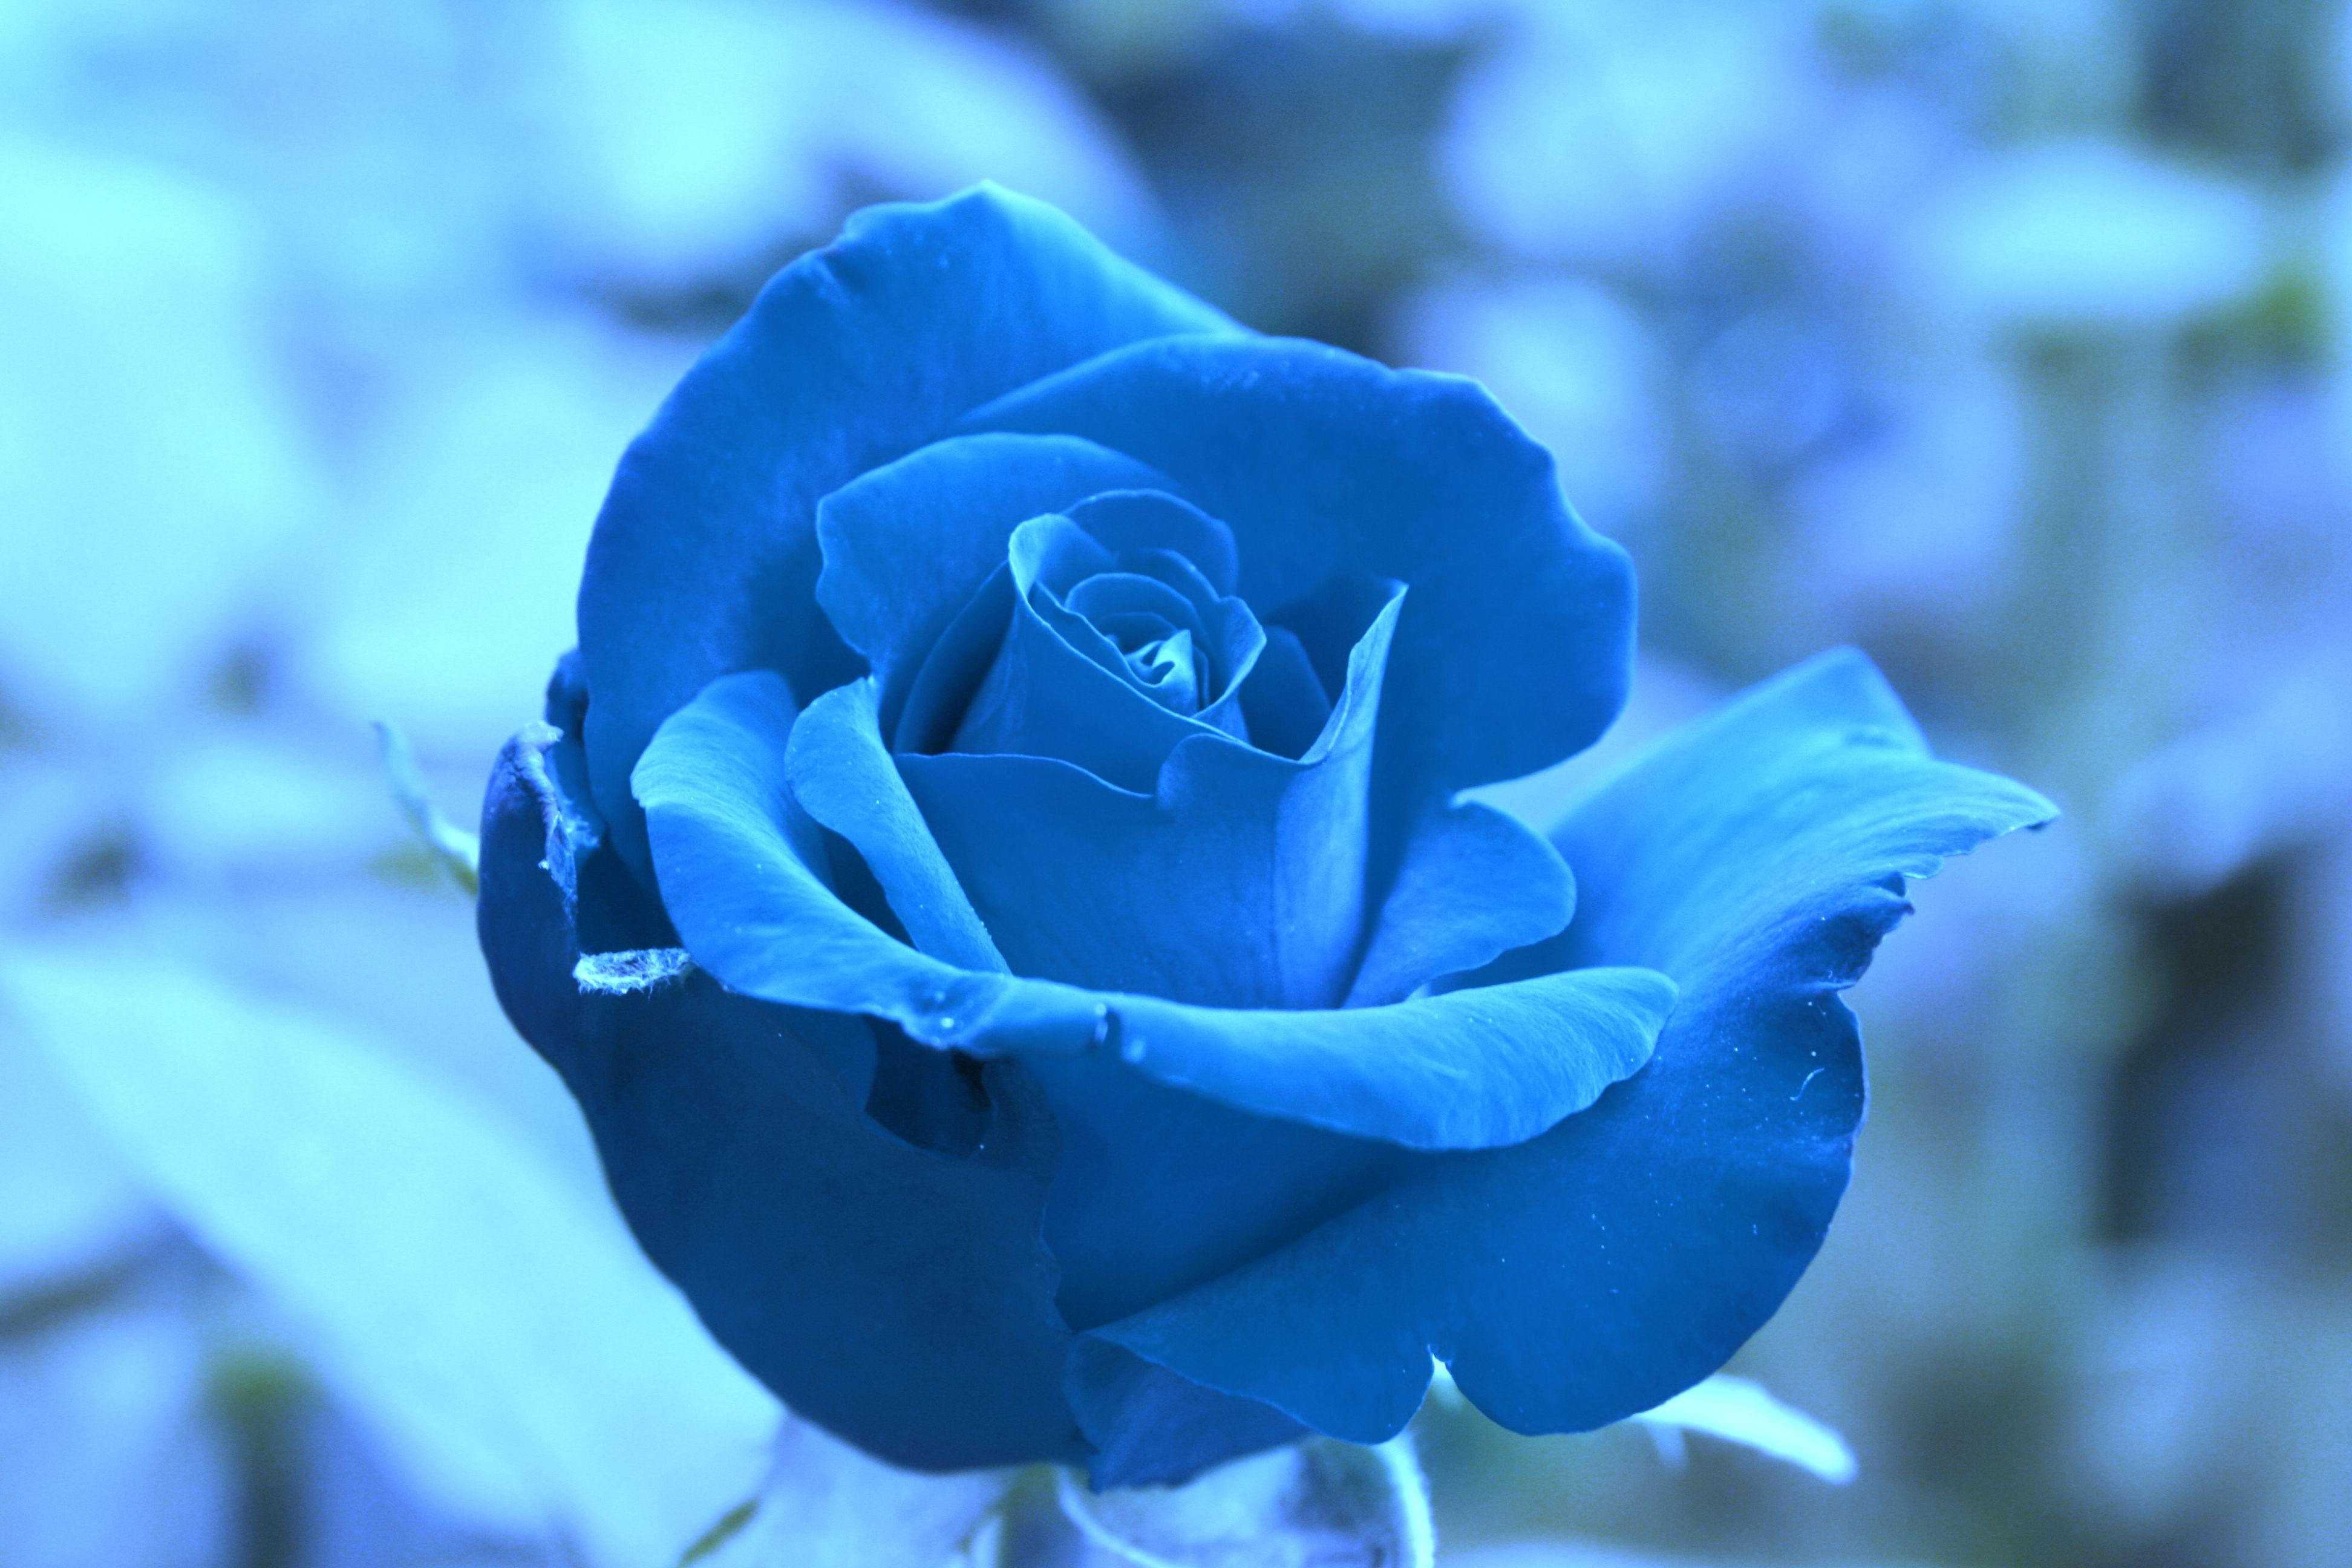 Beautiful Blue Roses Blue rose ♥, beautiful, blue